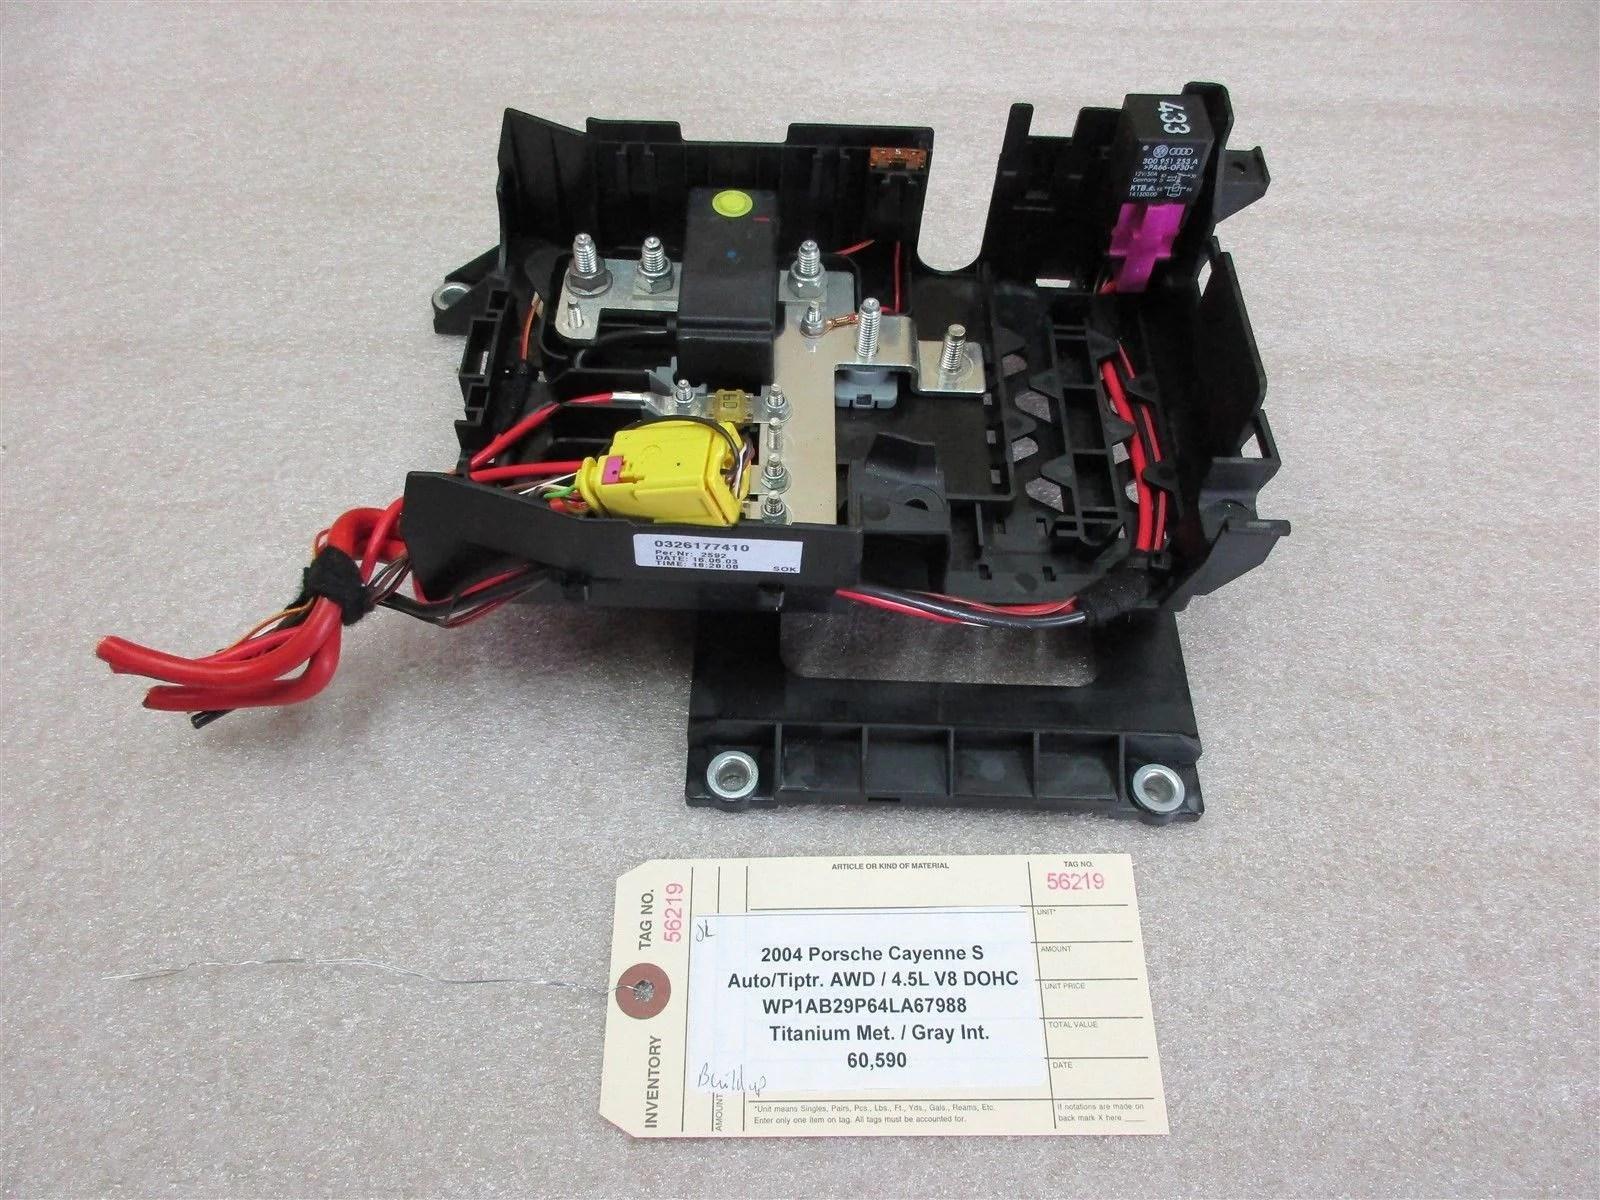 small resolution of 04 cayenne s awd porsche 955 seat fuse box relay 7l0937548 2012 jaguar xj fuse box 2004 porsche cayenne fuse box